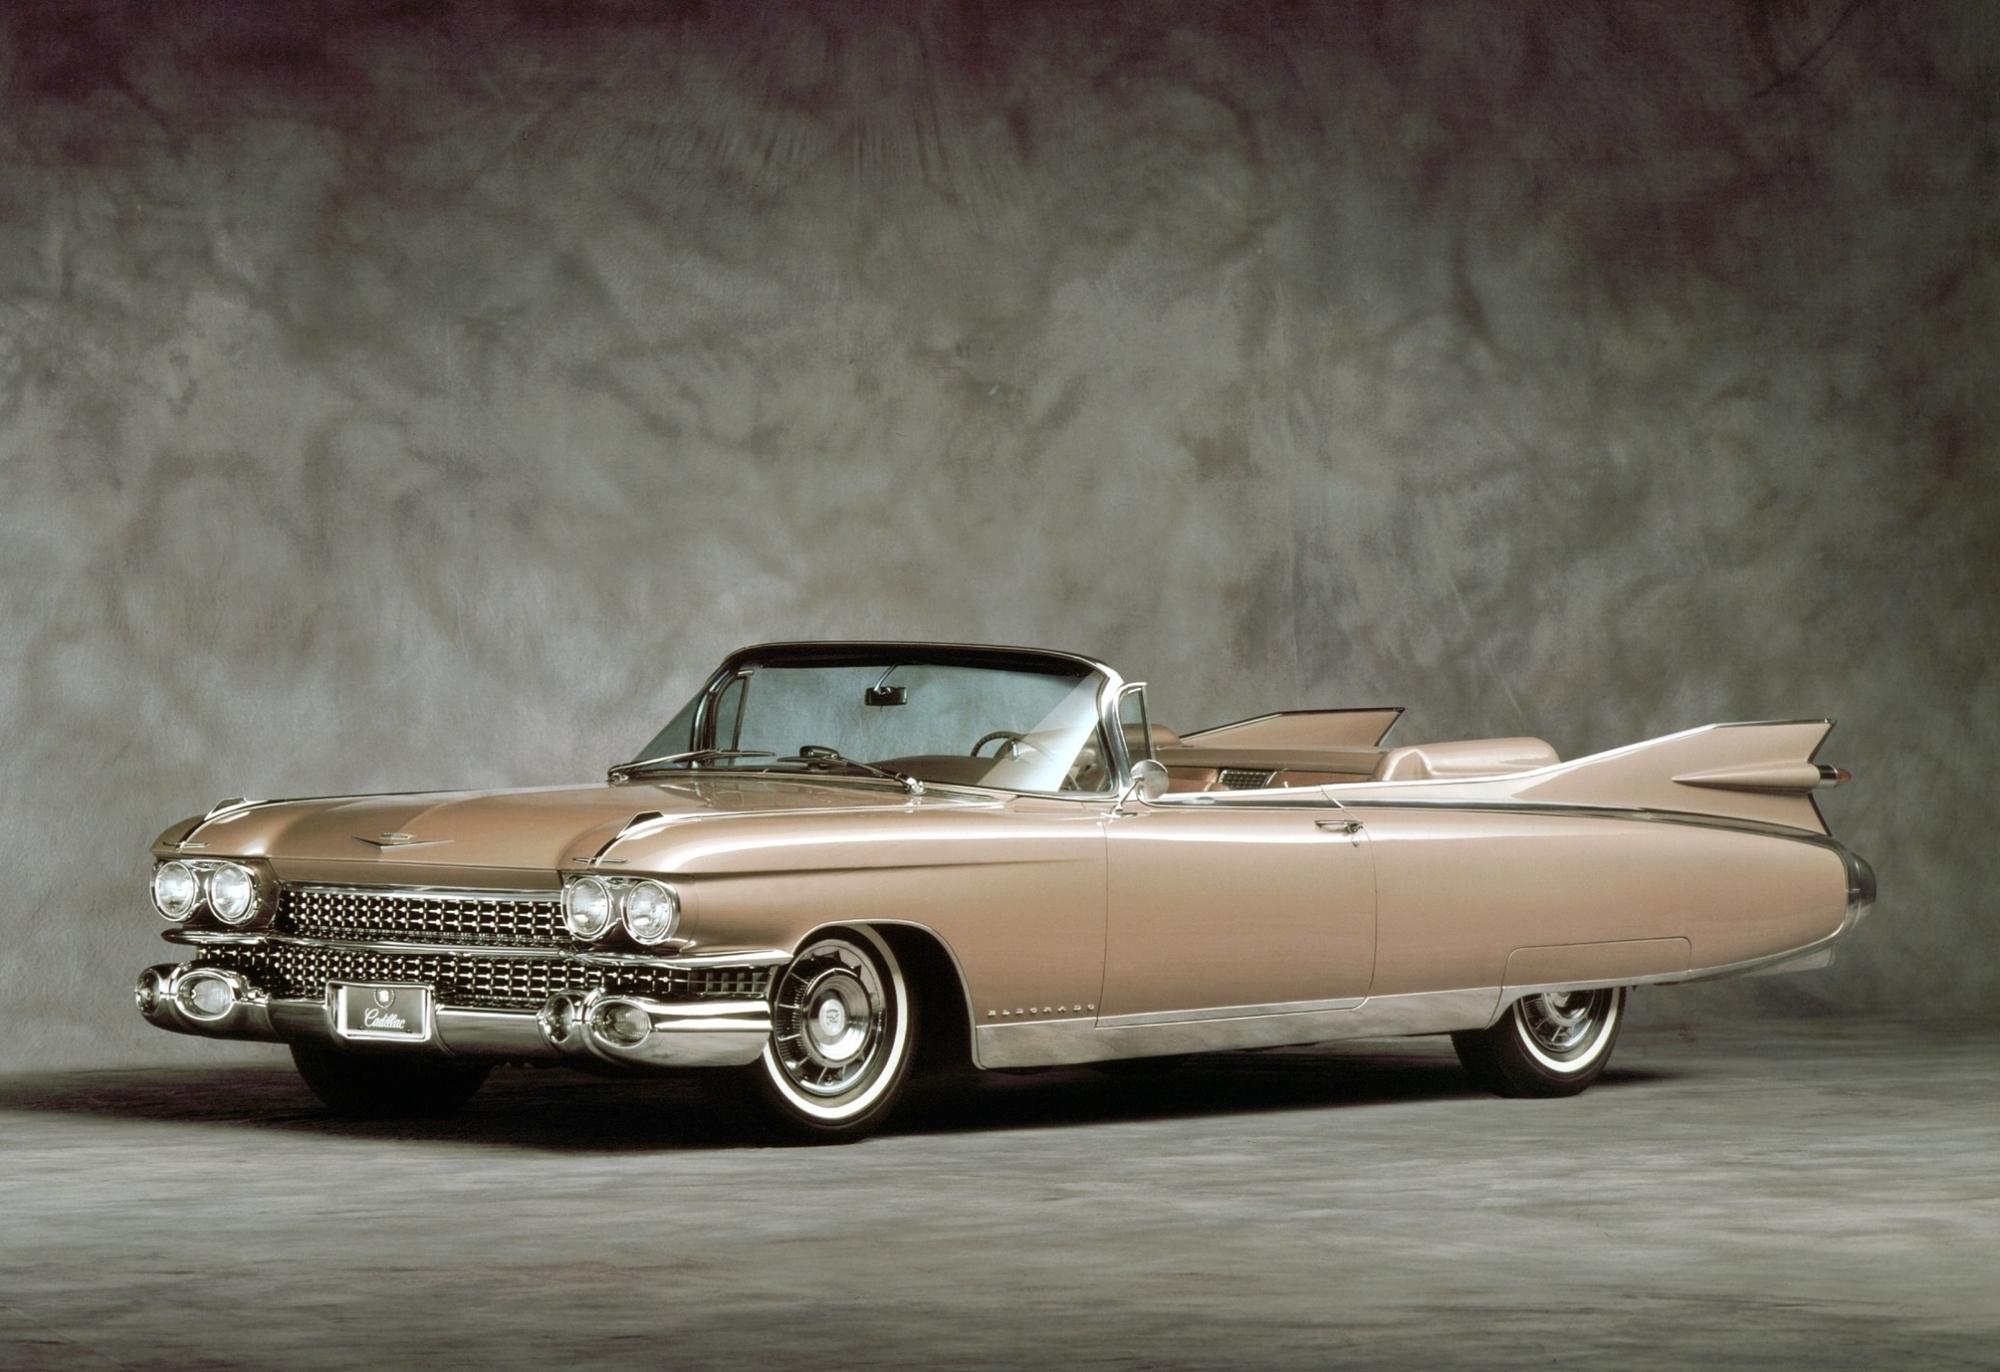 Der 1959er Cadillac Eldorado mit Heckflosse